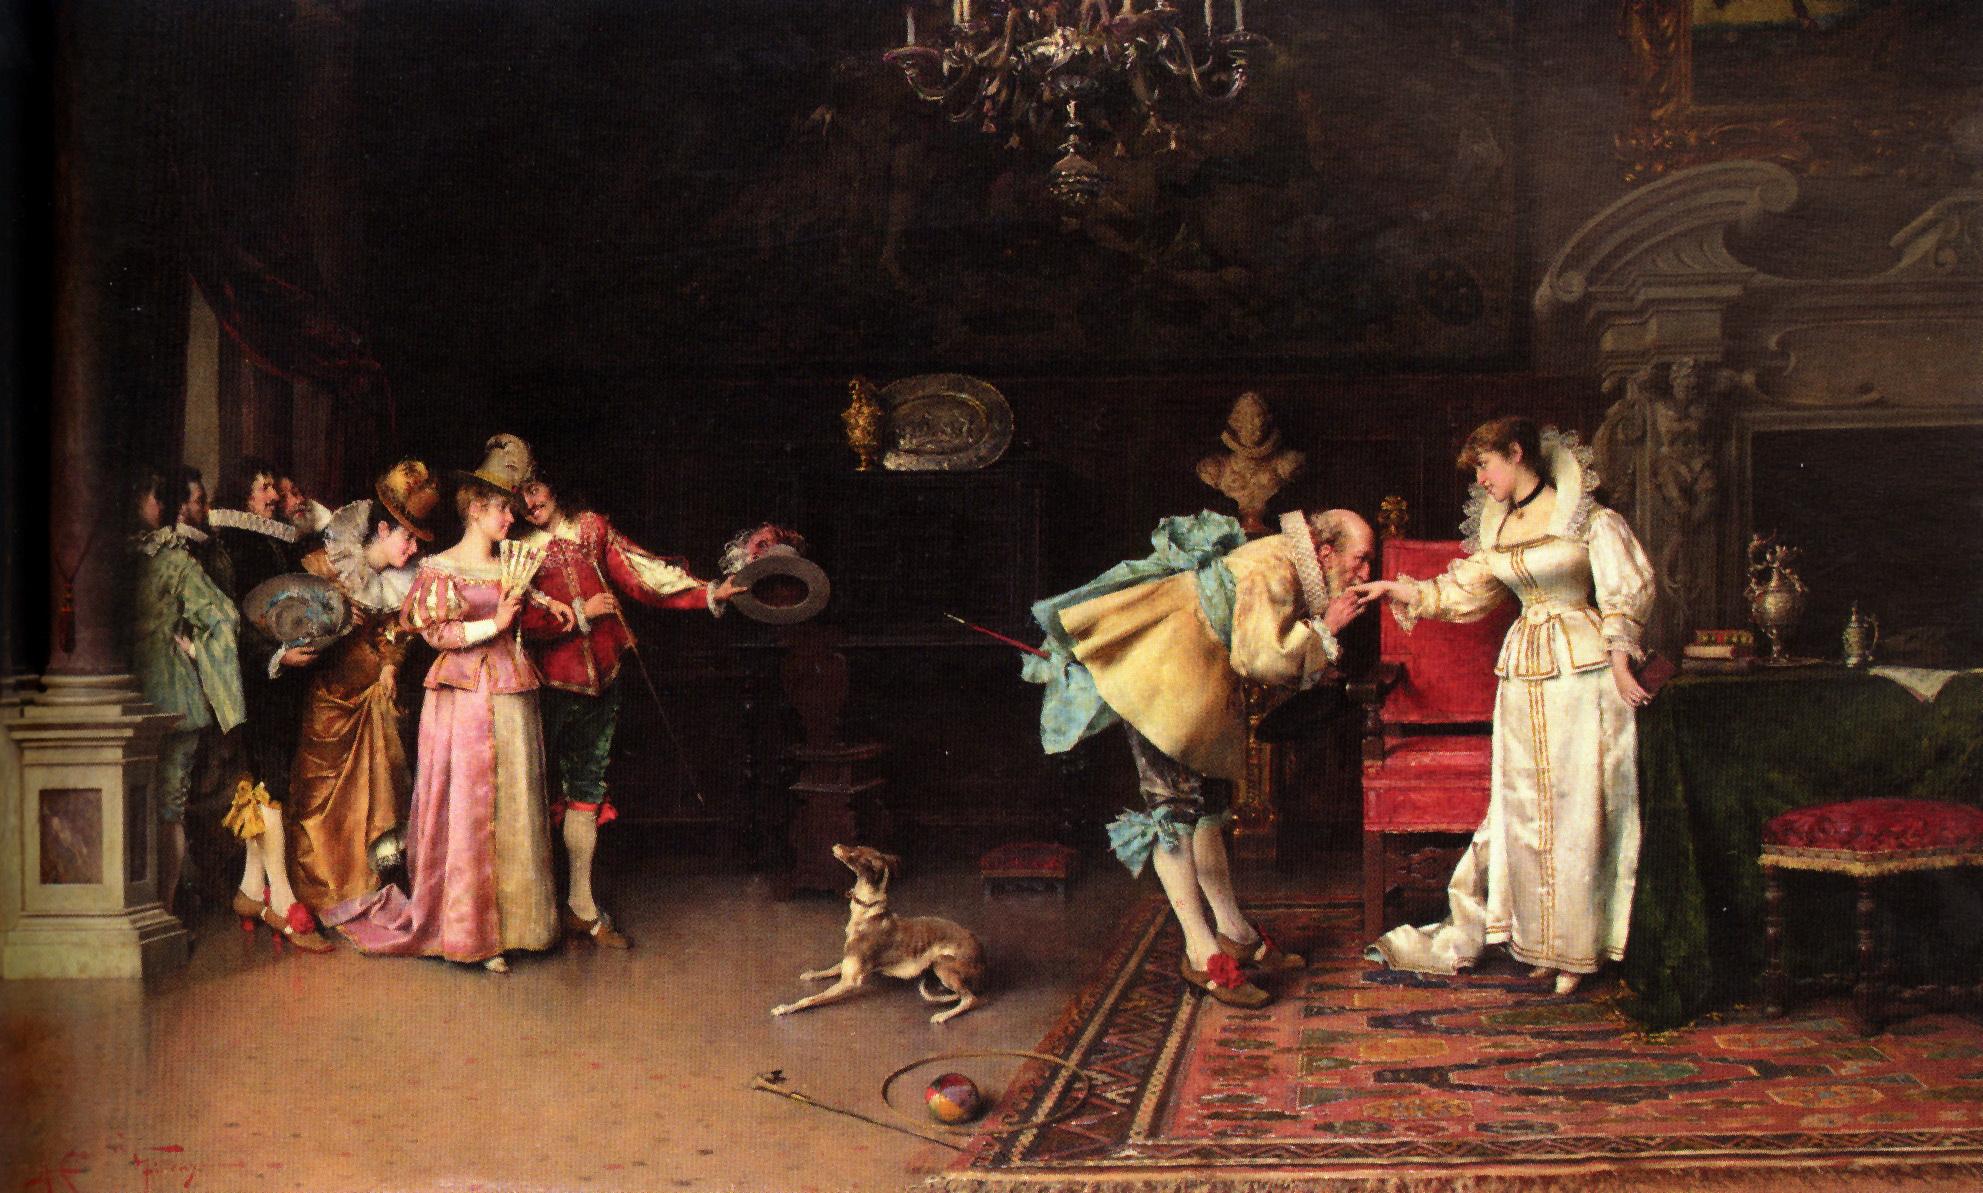 Old Fashioned Gallantry :: Adriano Cecchi - Romantic scenes in art and painting ôîòî